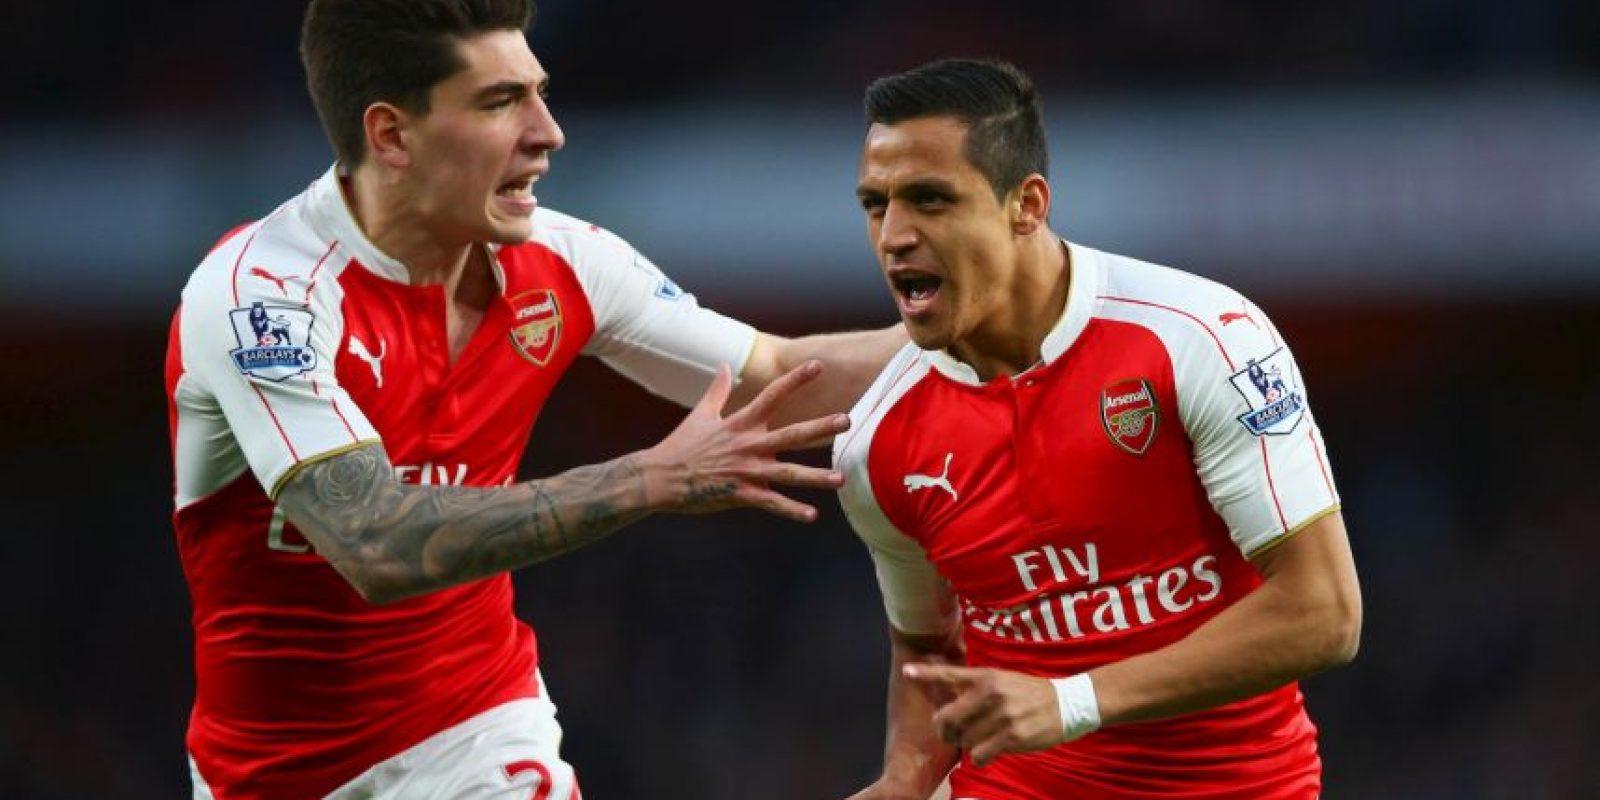 Arsenal completa el top 5 Foto:Getty Images